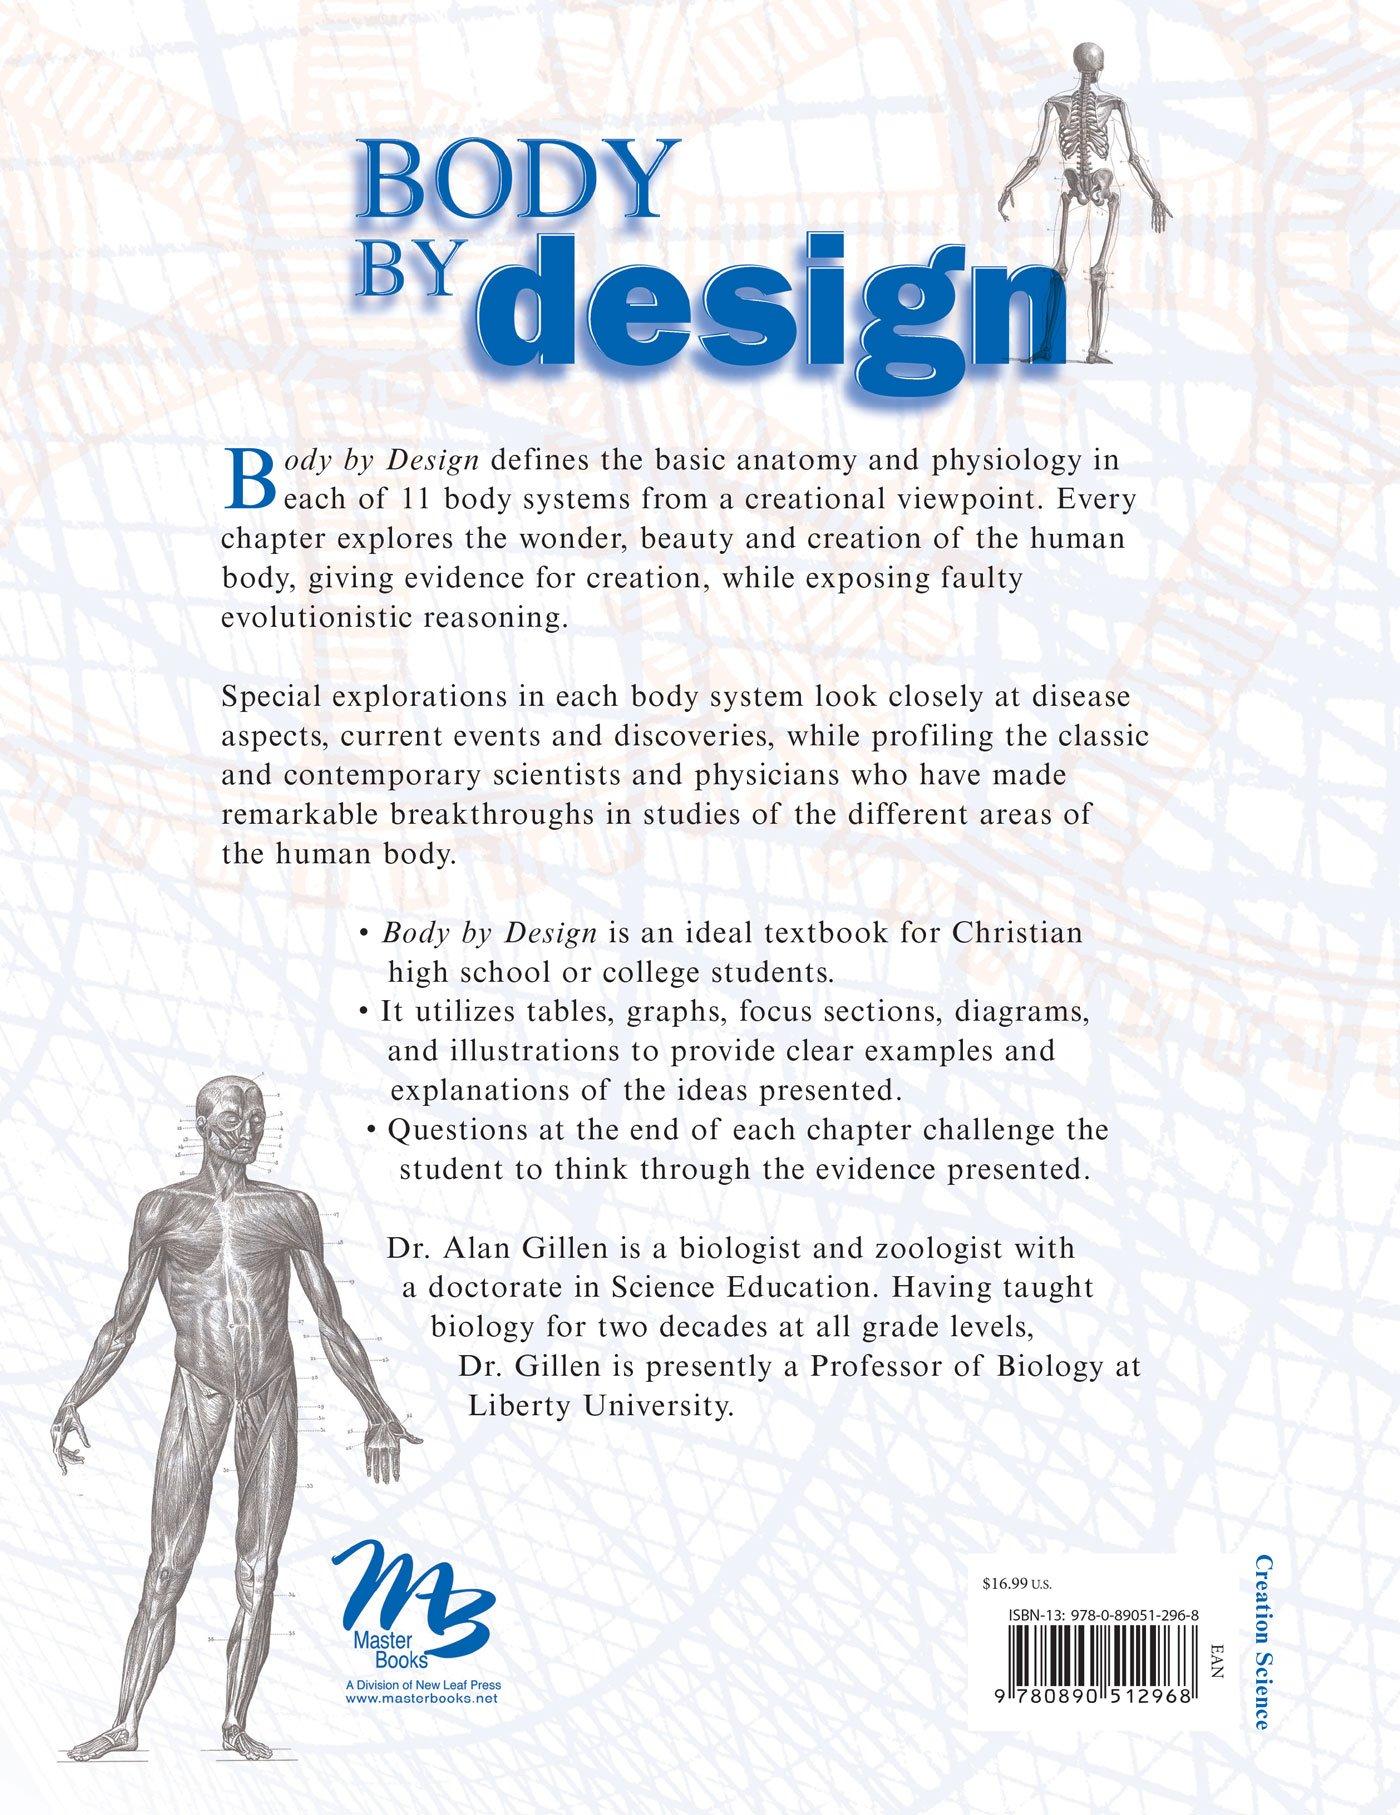 Body By Design: Alan Gillen: 0000000881920: Physiology: Amazon Canada